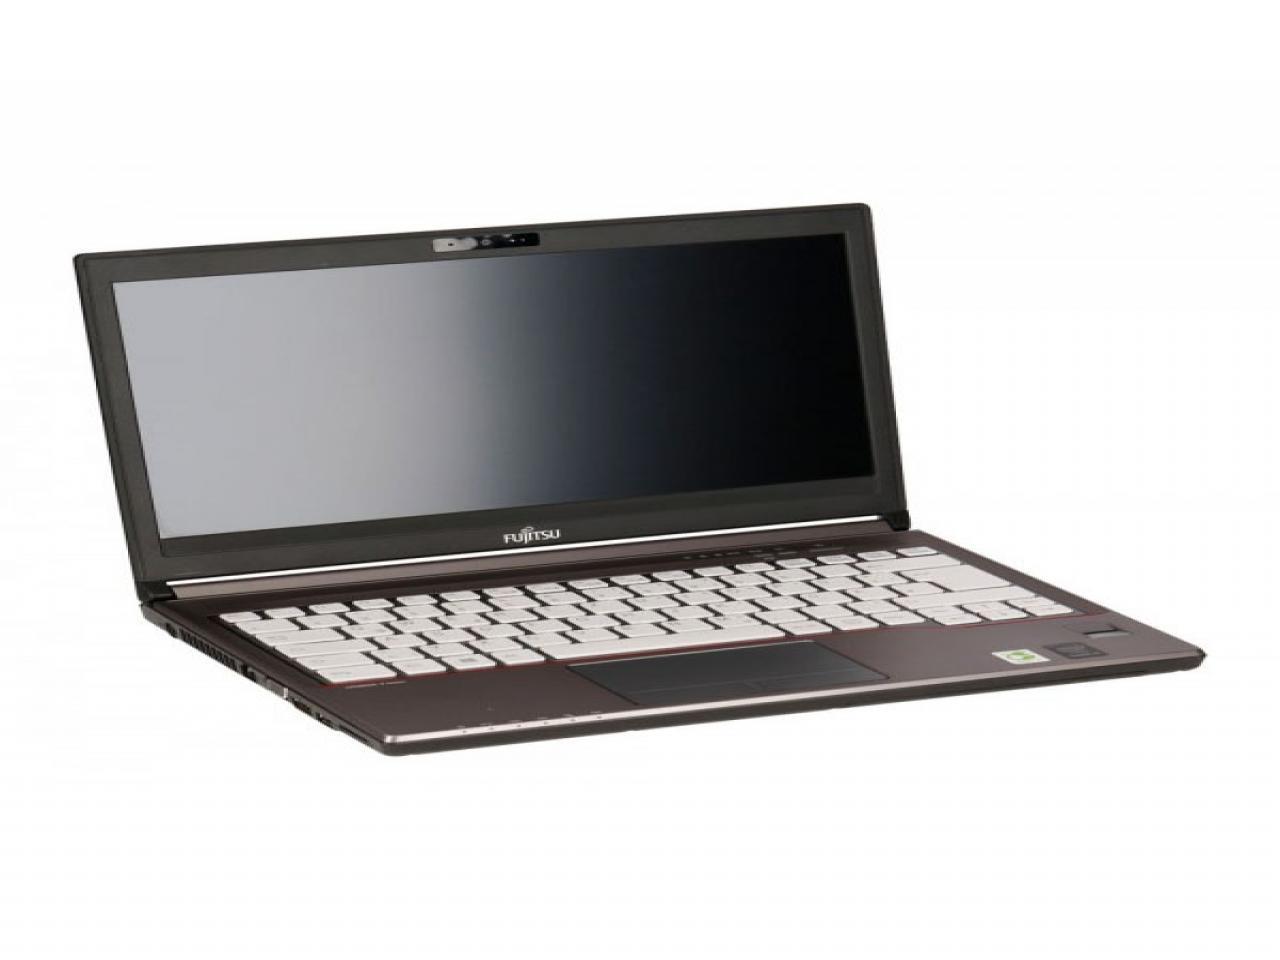 Fujitsu LifeBook E736 (weißeTastatur)  - shop.bb-net.de